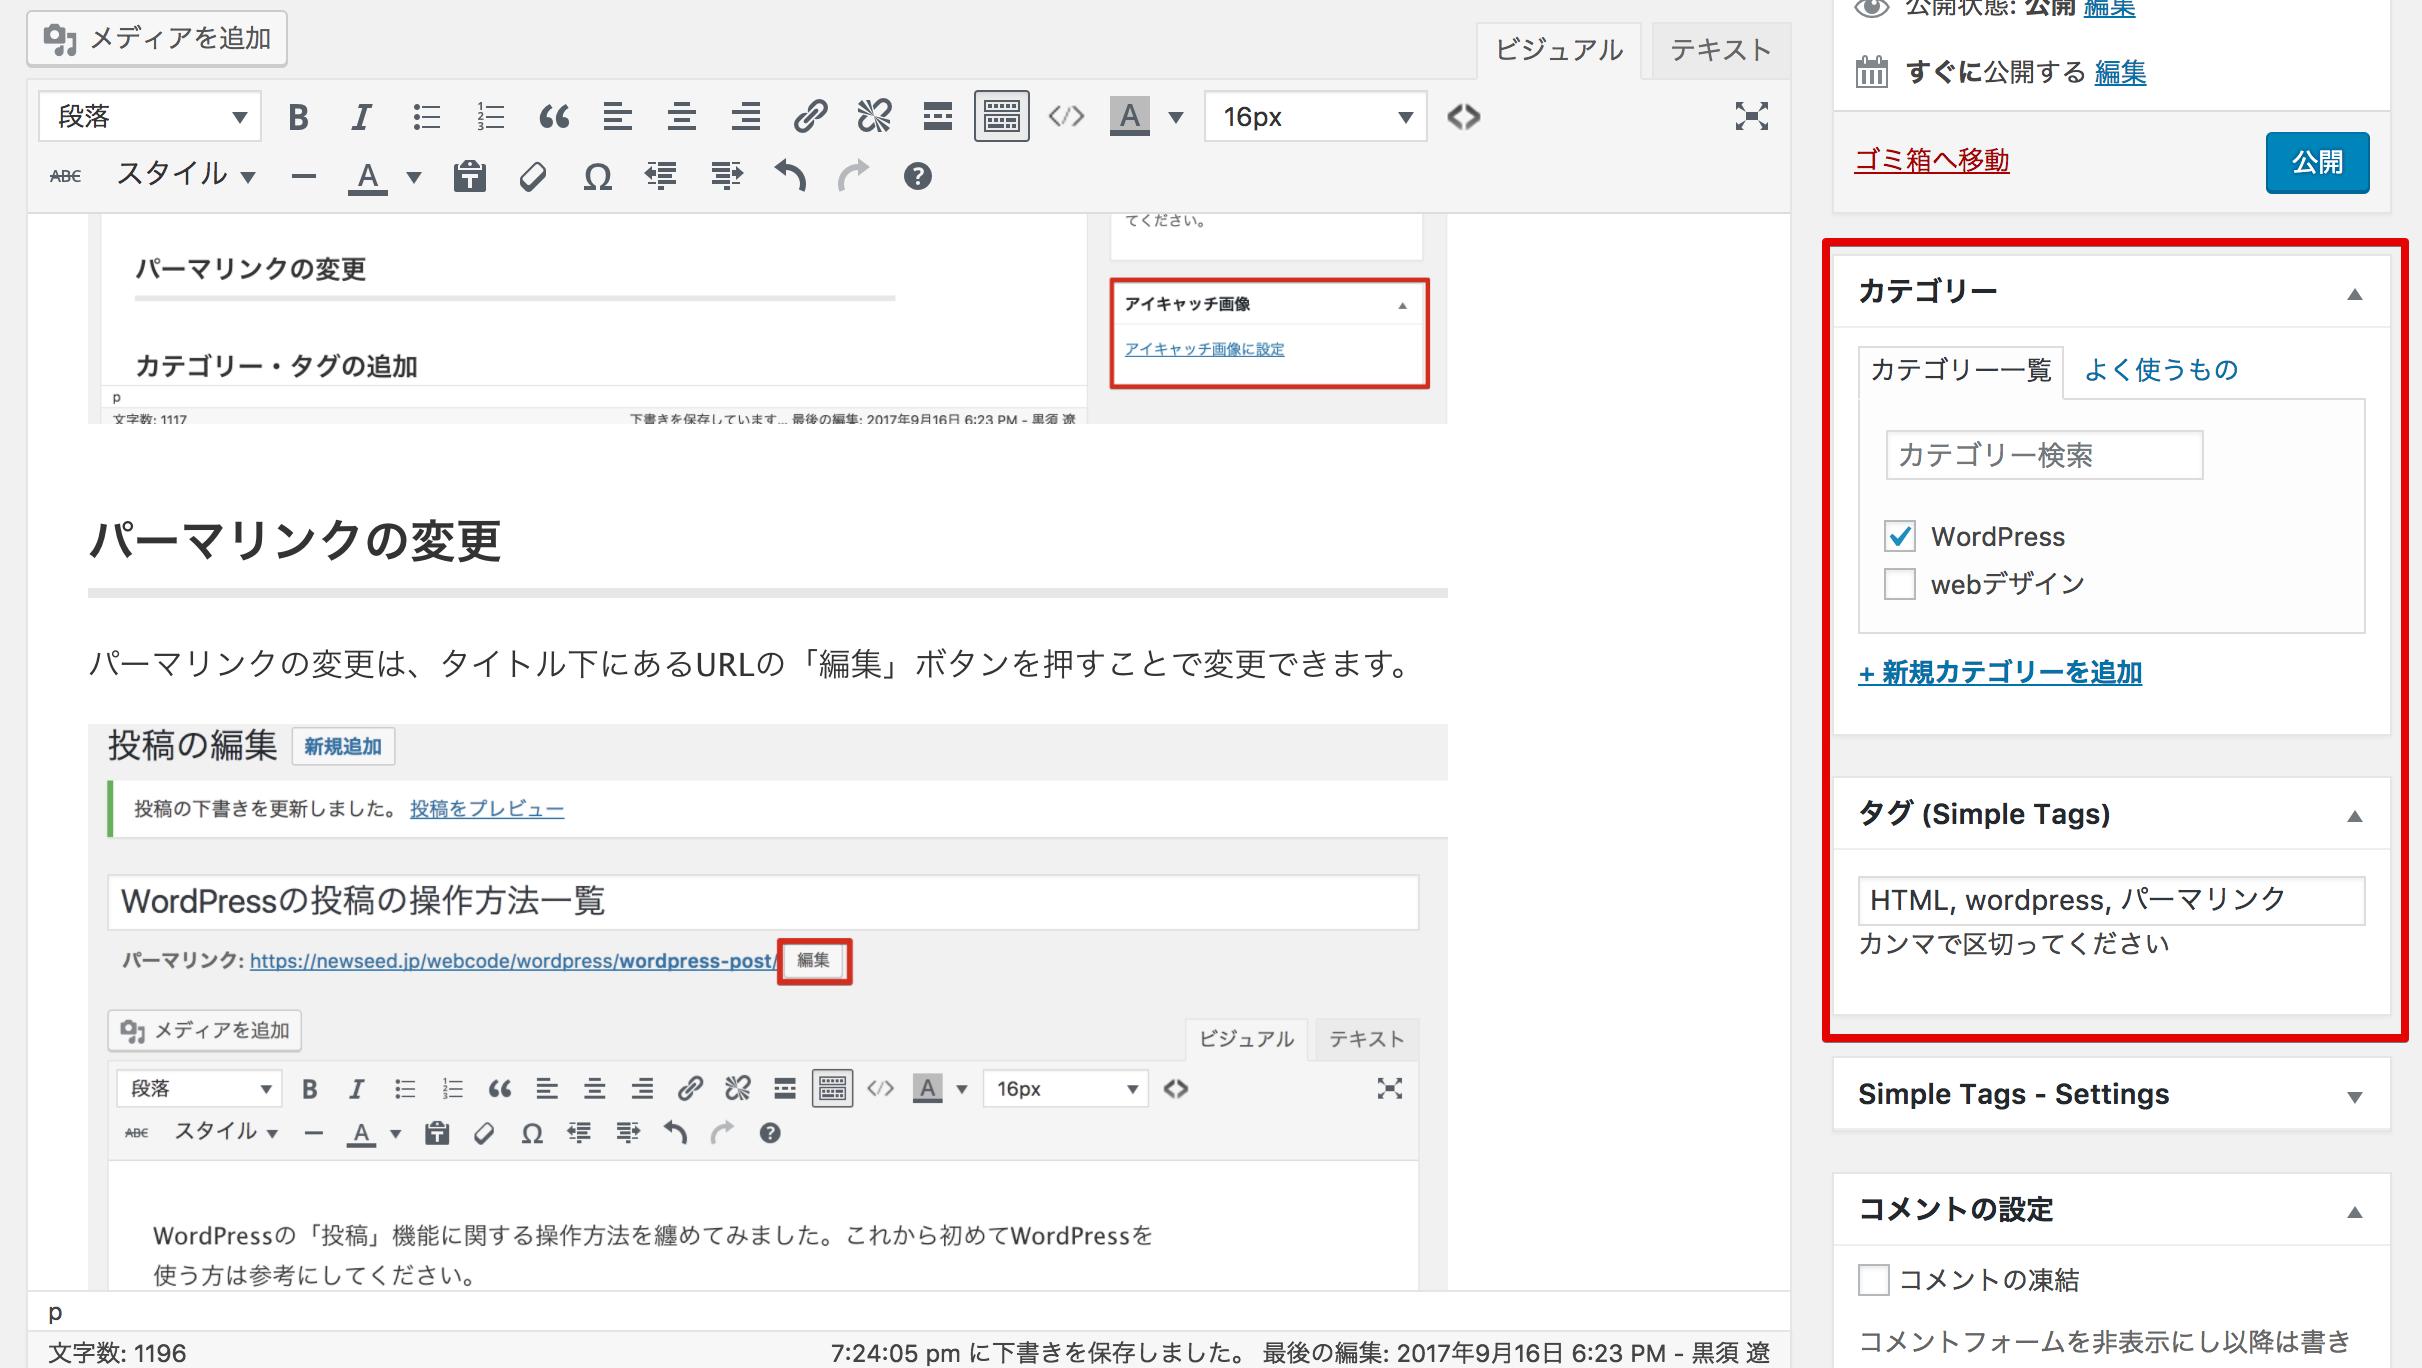 007685ded5da6b4e037330c147123143 - 初心者向け!WordPressの投稿方法や記事の編集方法を徹底解説